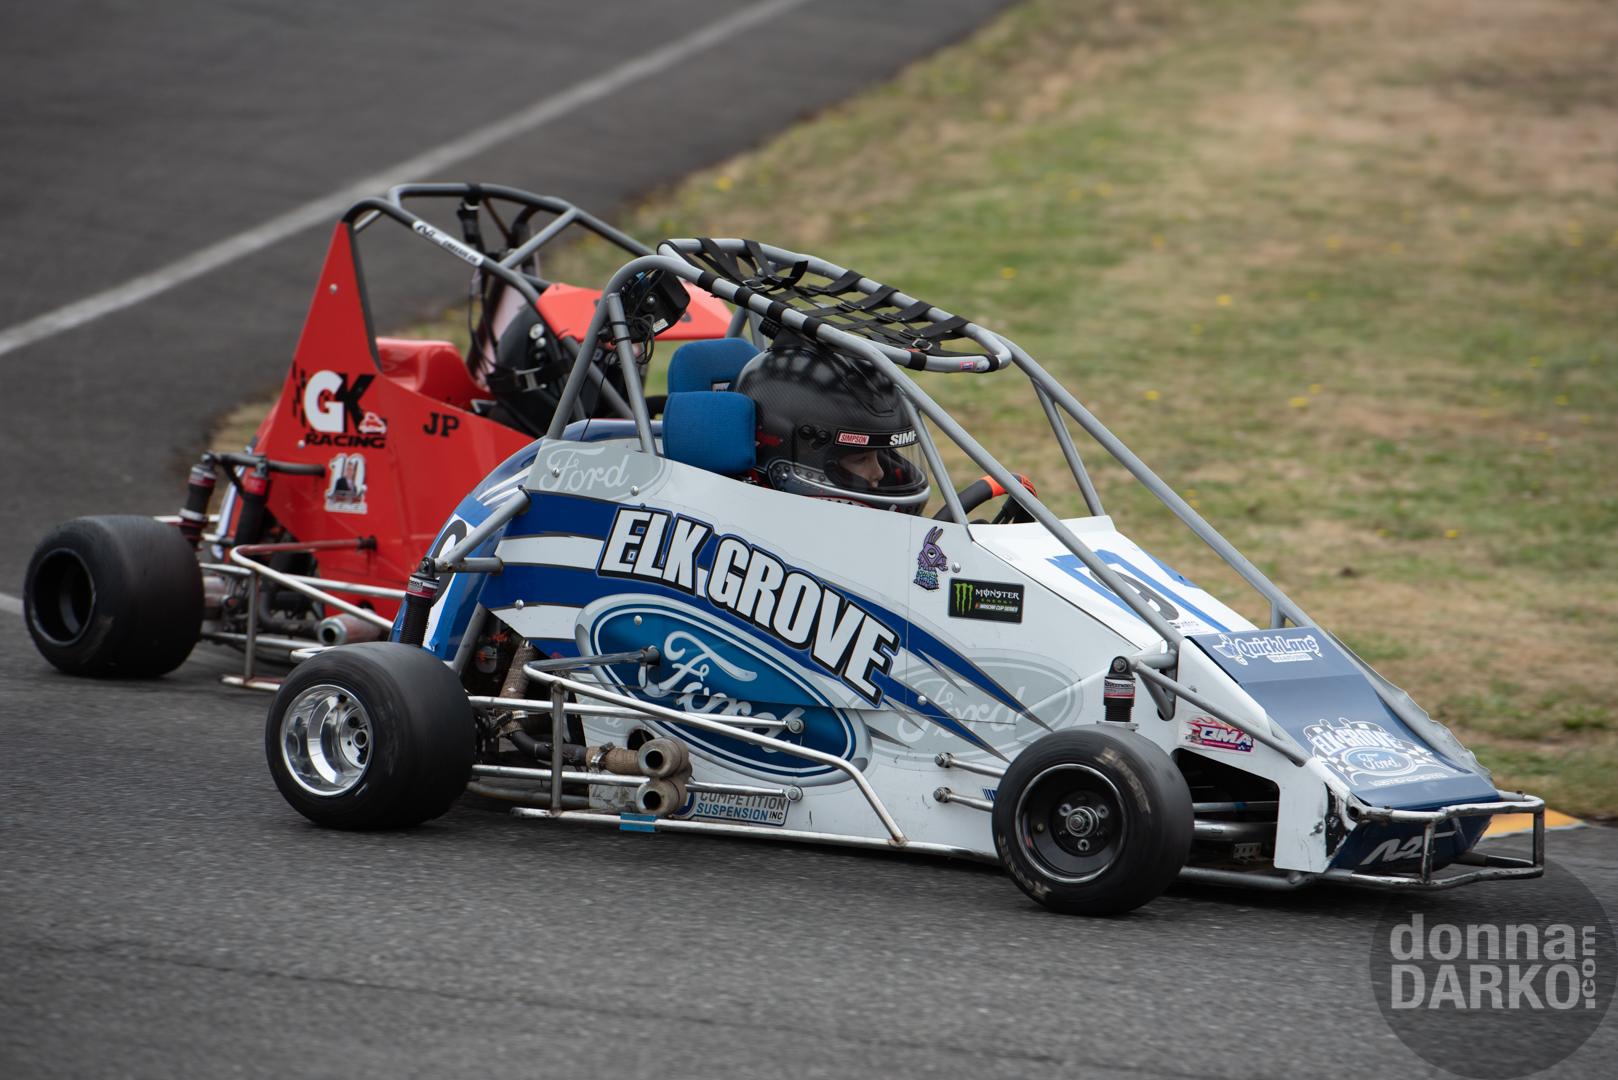 QWMA (Racing) 8-11-2019 DSC_5686.jpg